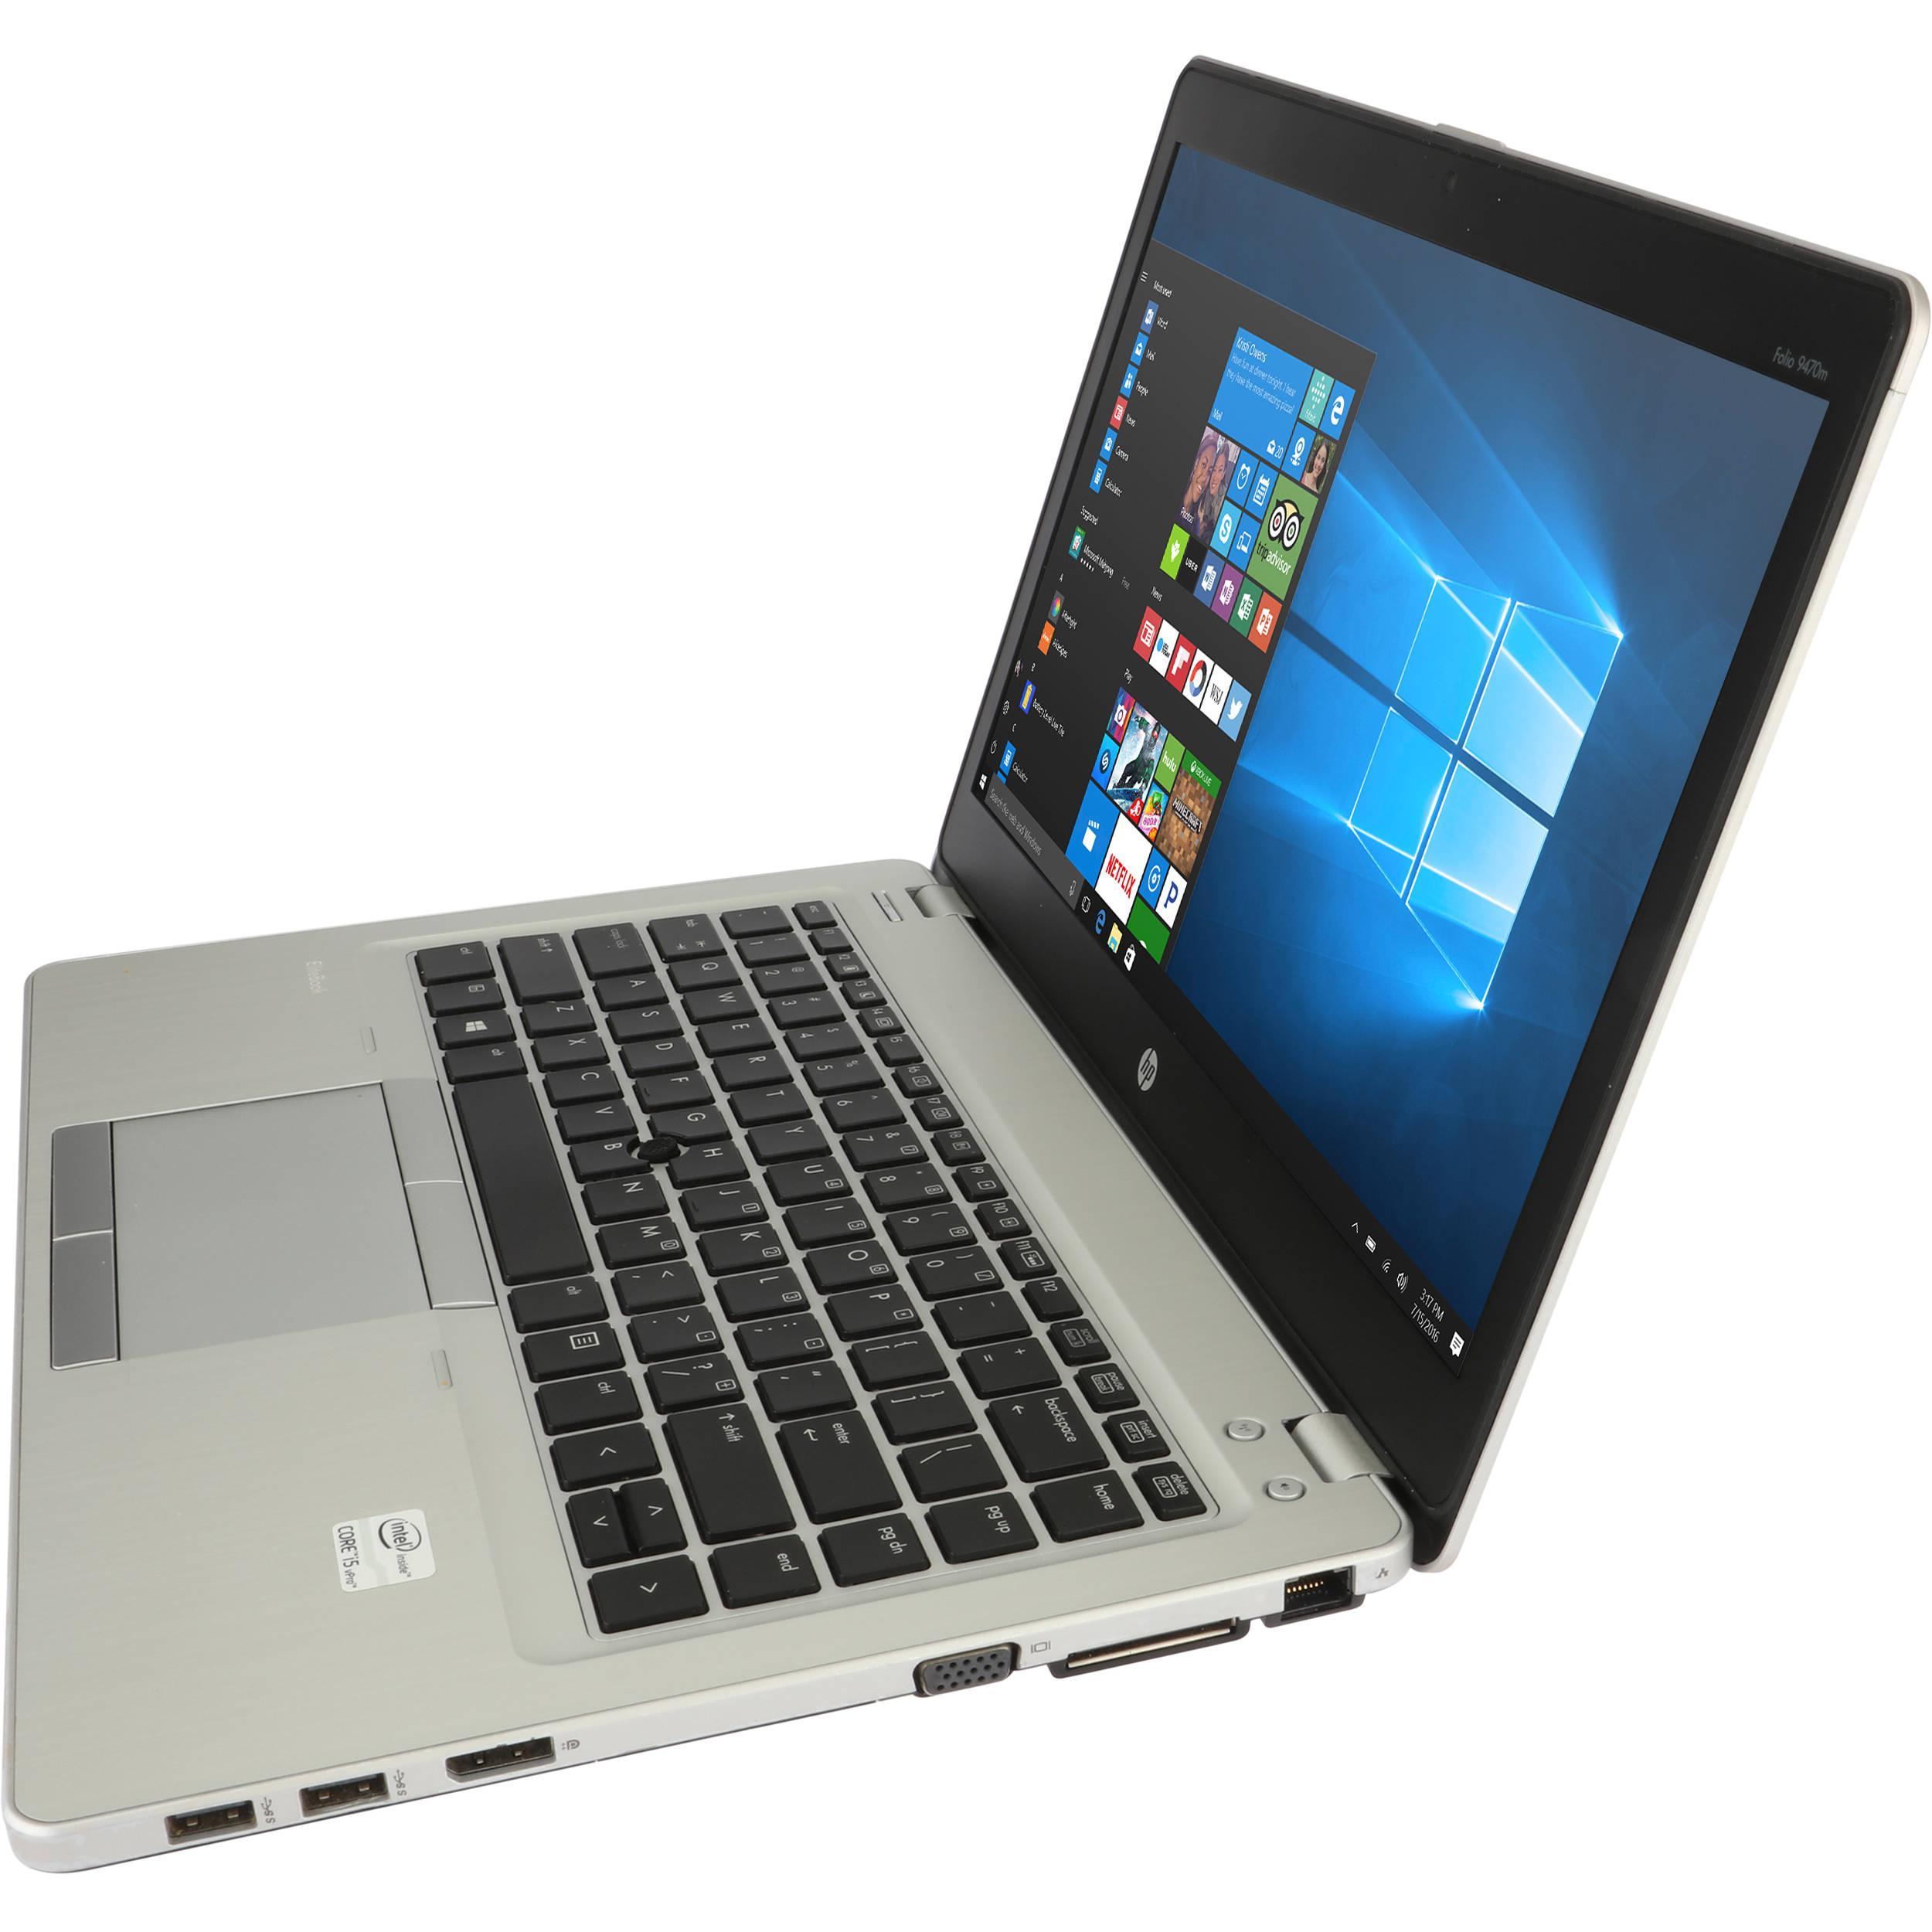 Hp Elitebook Folio 9470M 14-inch (2012) - Core i5-3427U - 8 GB  - SSD 240 GB